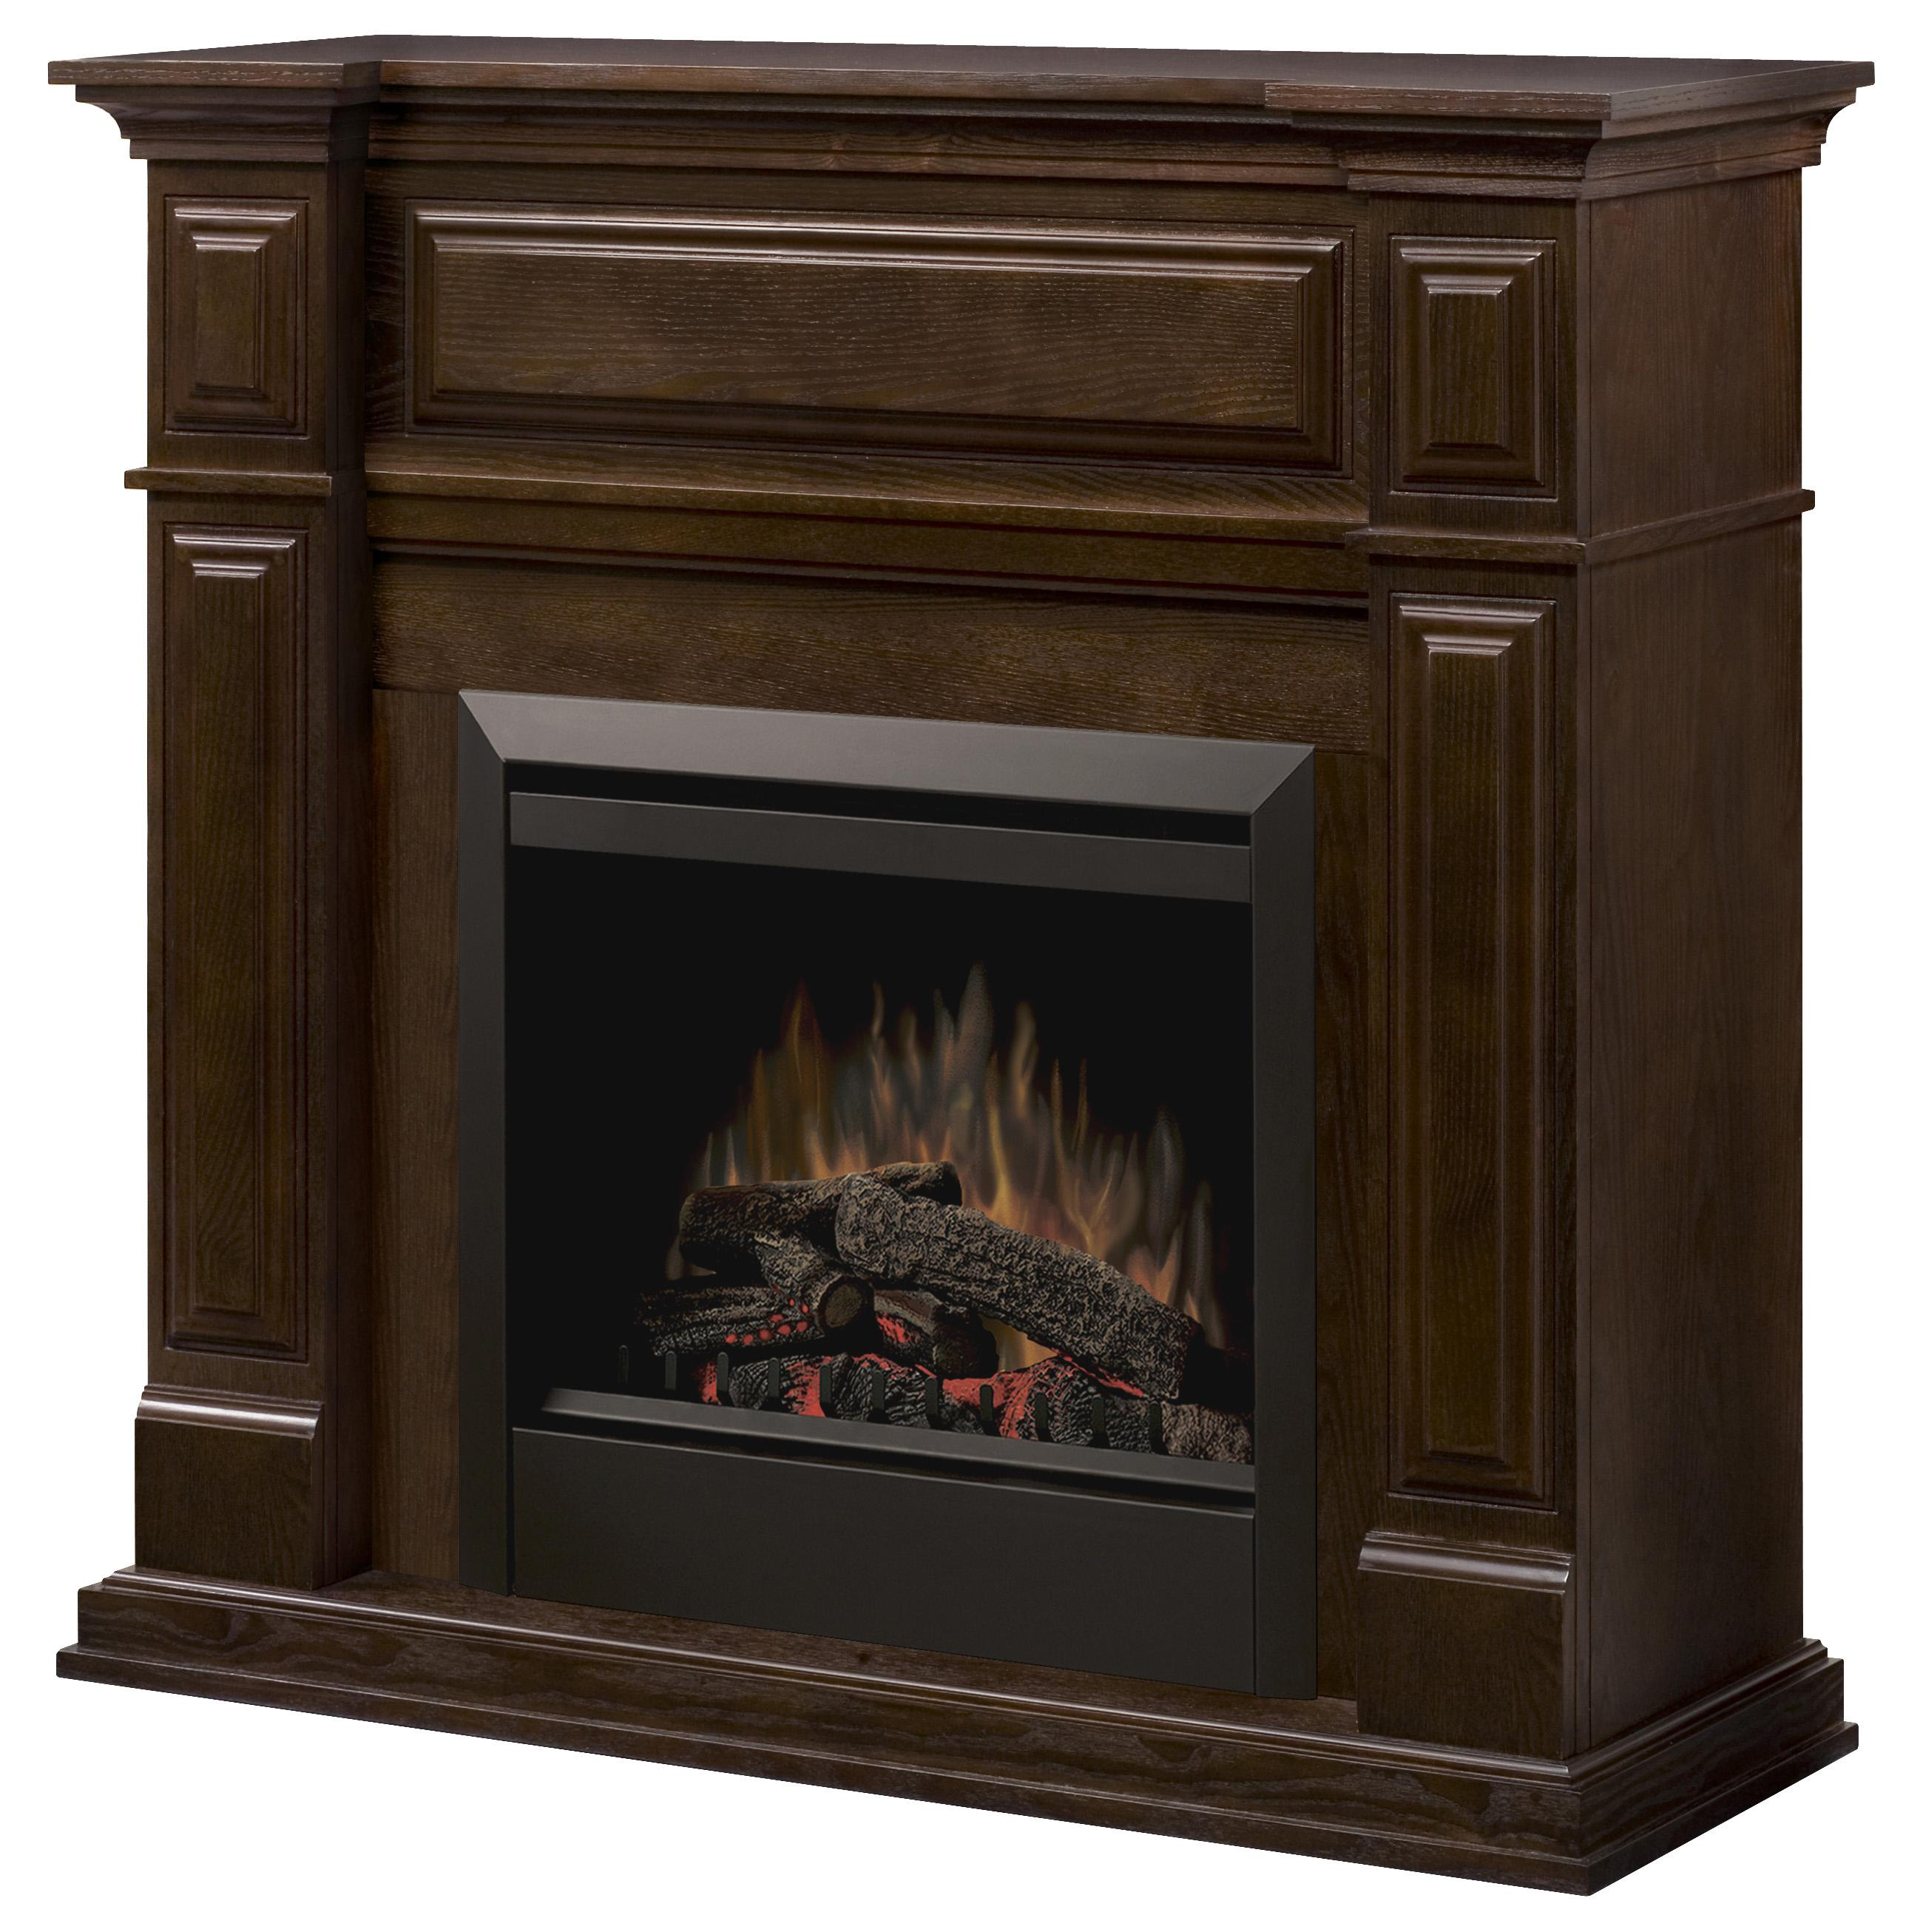 Dimplex Flat Wall Fireplaces Trenton Flat Wall Fireplace